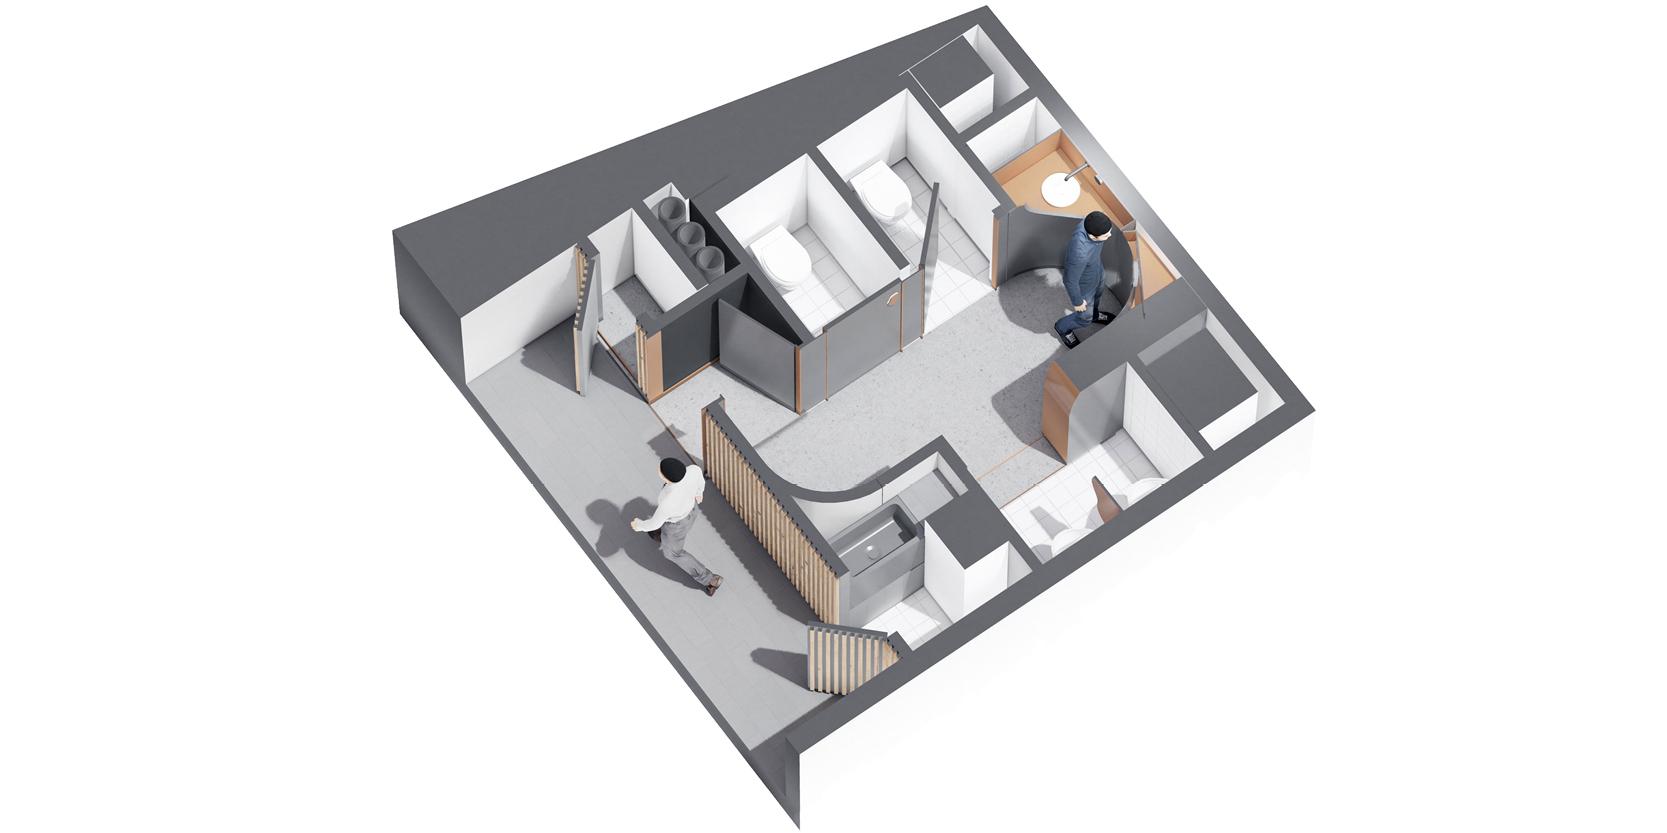 Reforma lavabos estadistica IDESCAT OCA Architects Arquitectura architecture interior design disseny interior Hernan Lleida Bernardo Garcia5